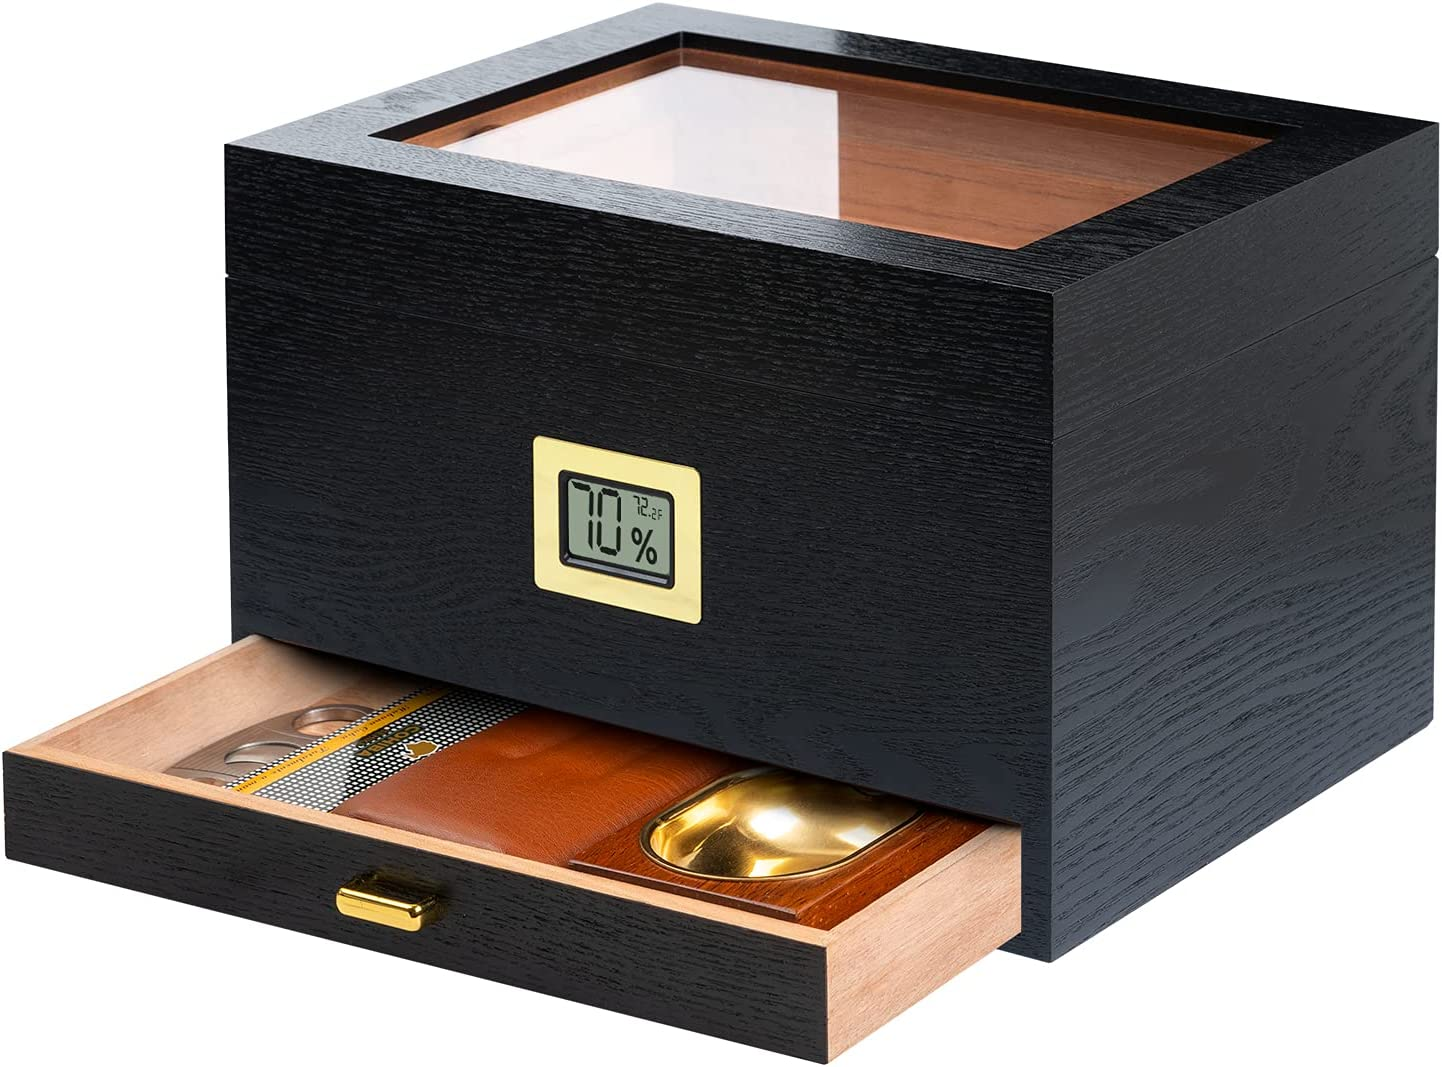 Epress Handmade Cigar Humidor Overseas parallel import regular item Spanish Natural lowest price with G Cedar Wood